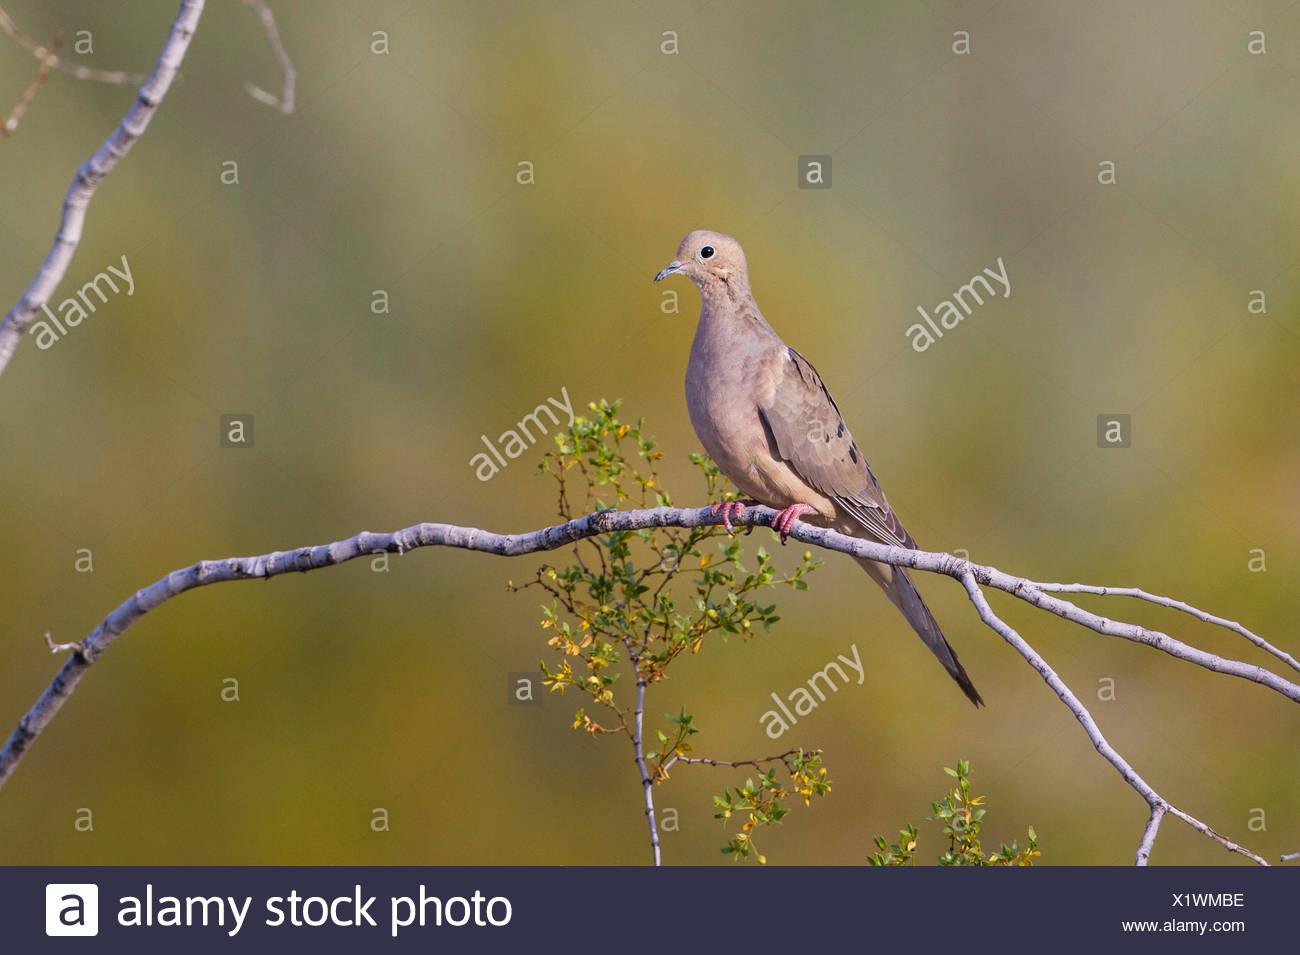 mourning dove (Zenaida macroura), sits on a branch, USA, Arizona - Stock Image